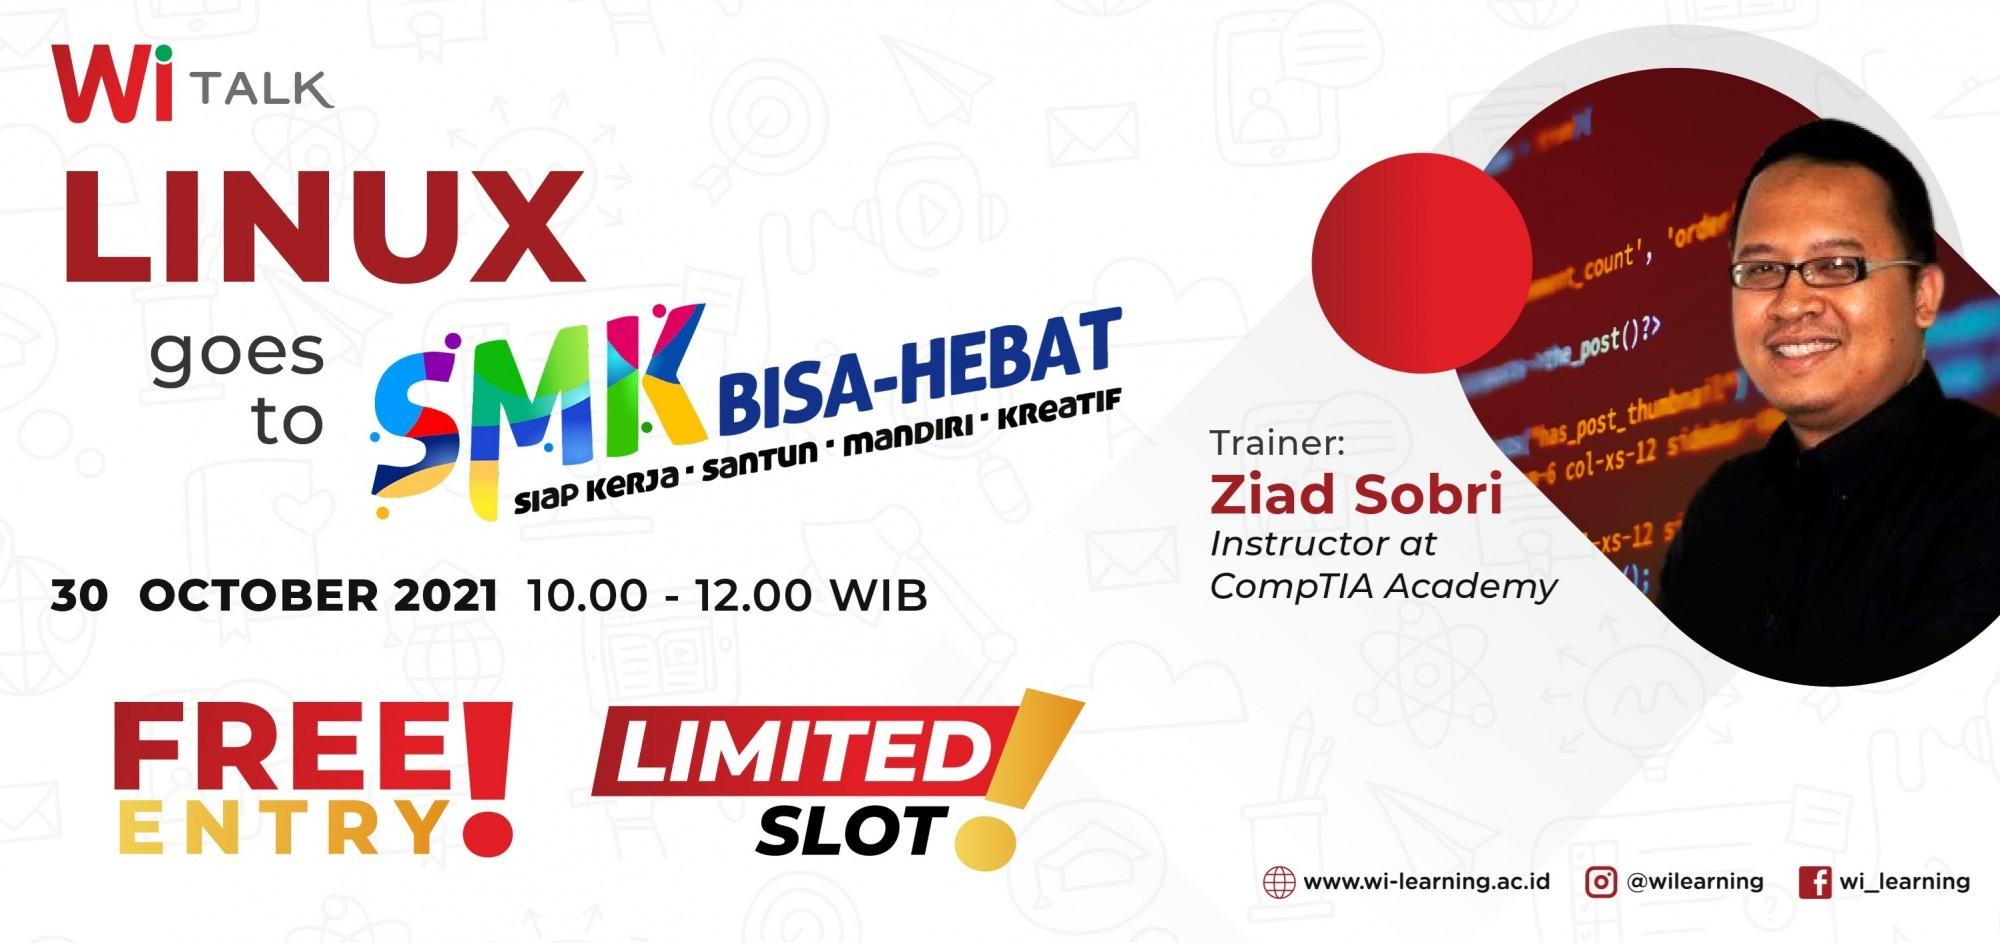 WiTalk : Linux goes to SMK Bisa Hebat